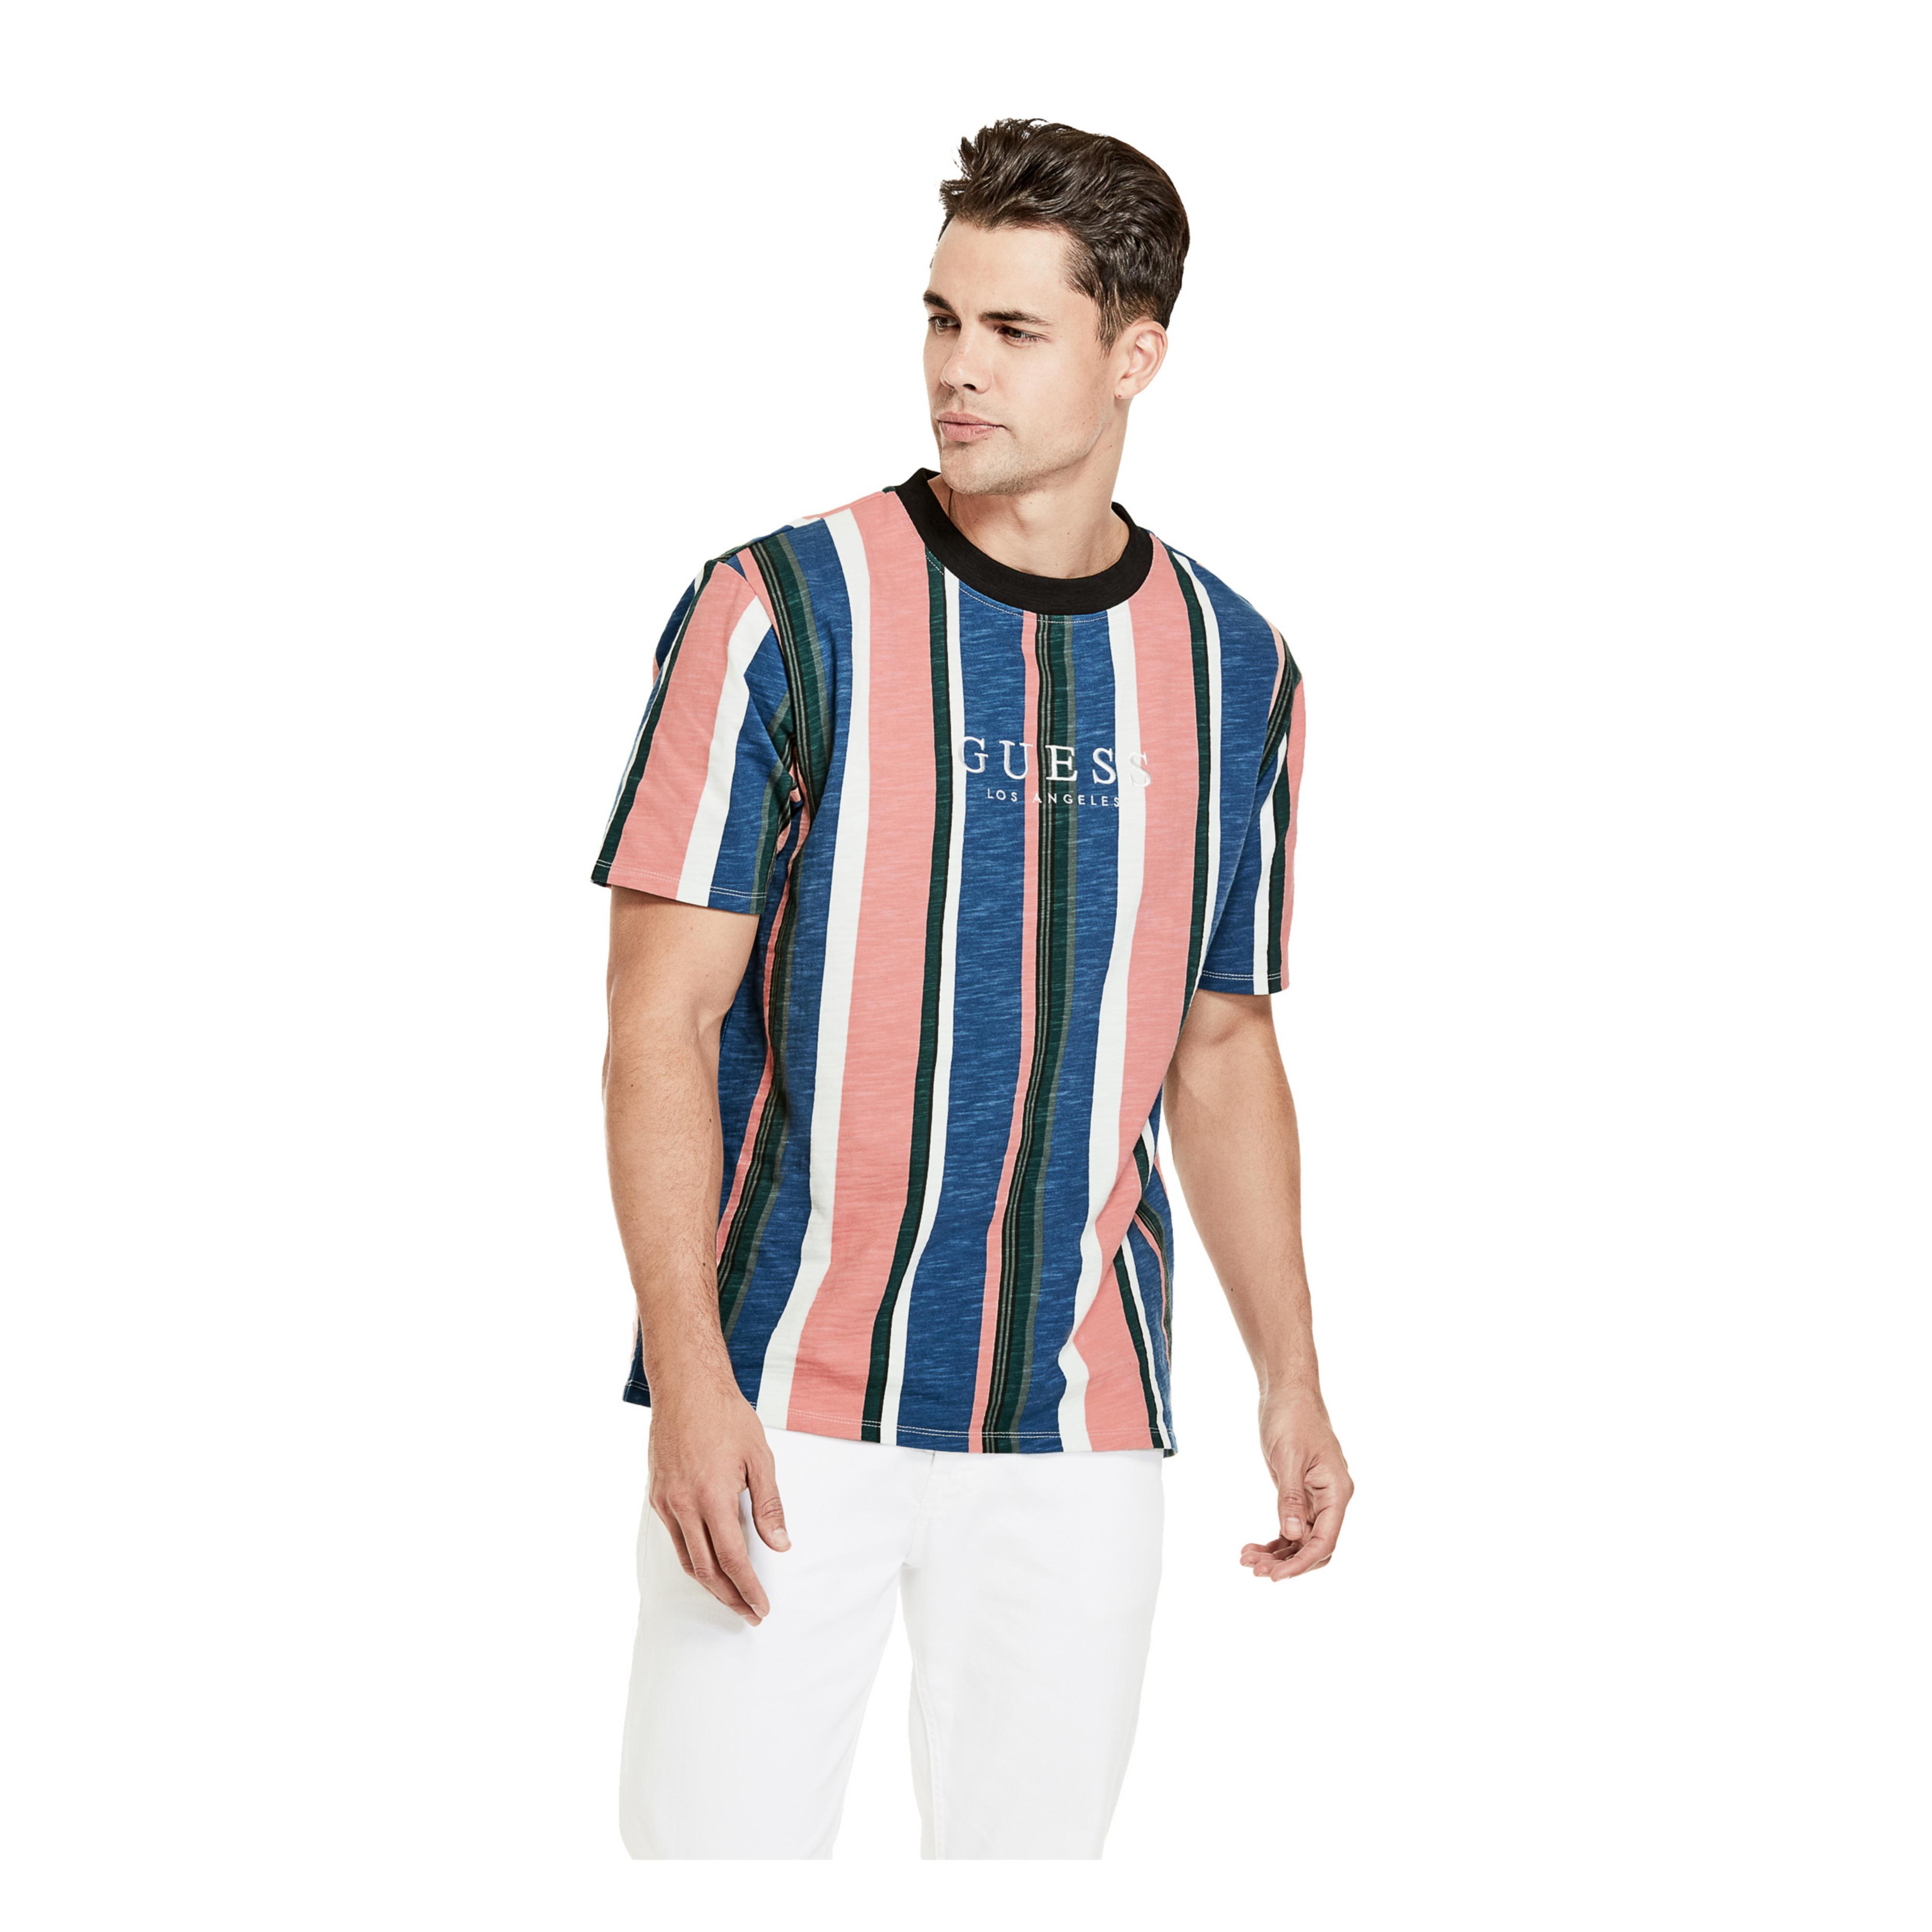 47c6b10f49 Guess Striped T Shirt David Sayer